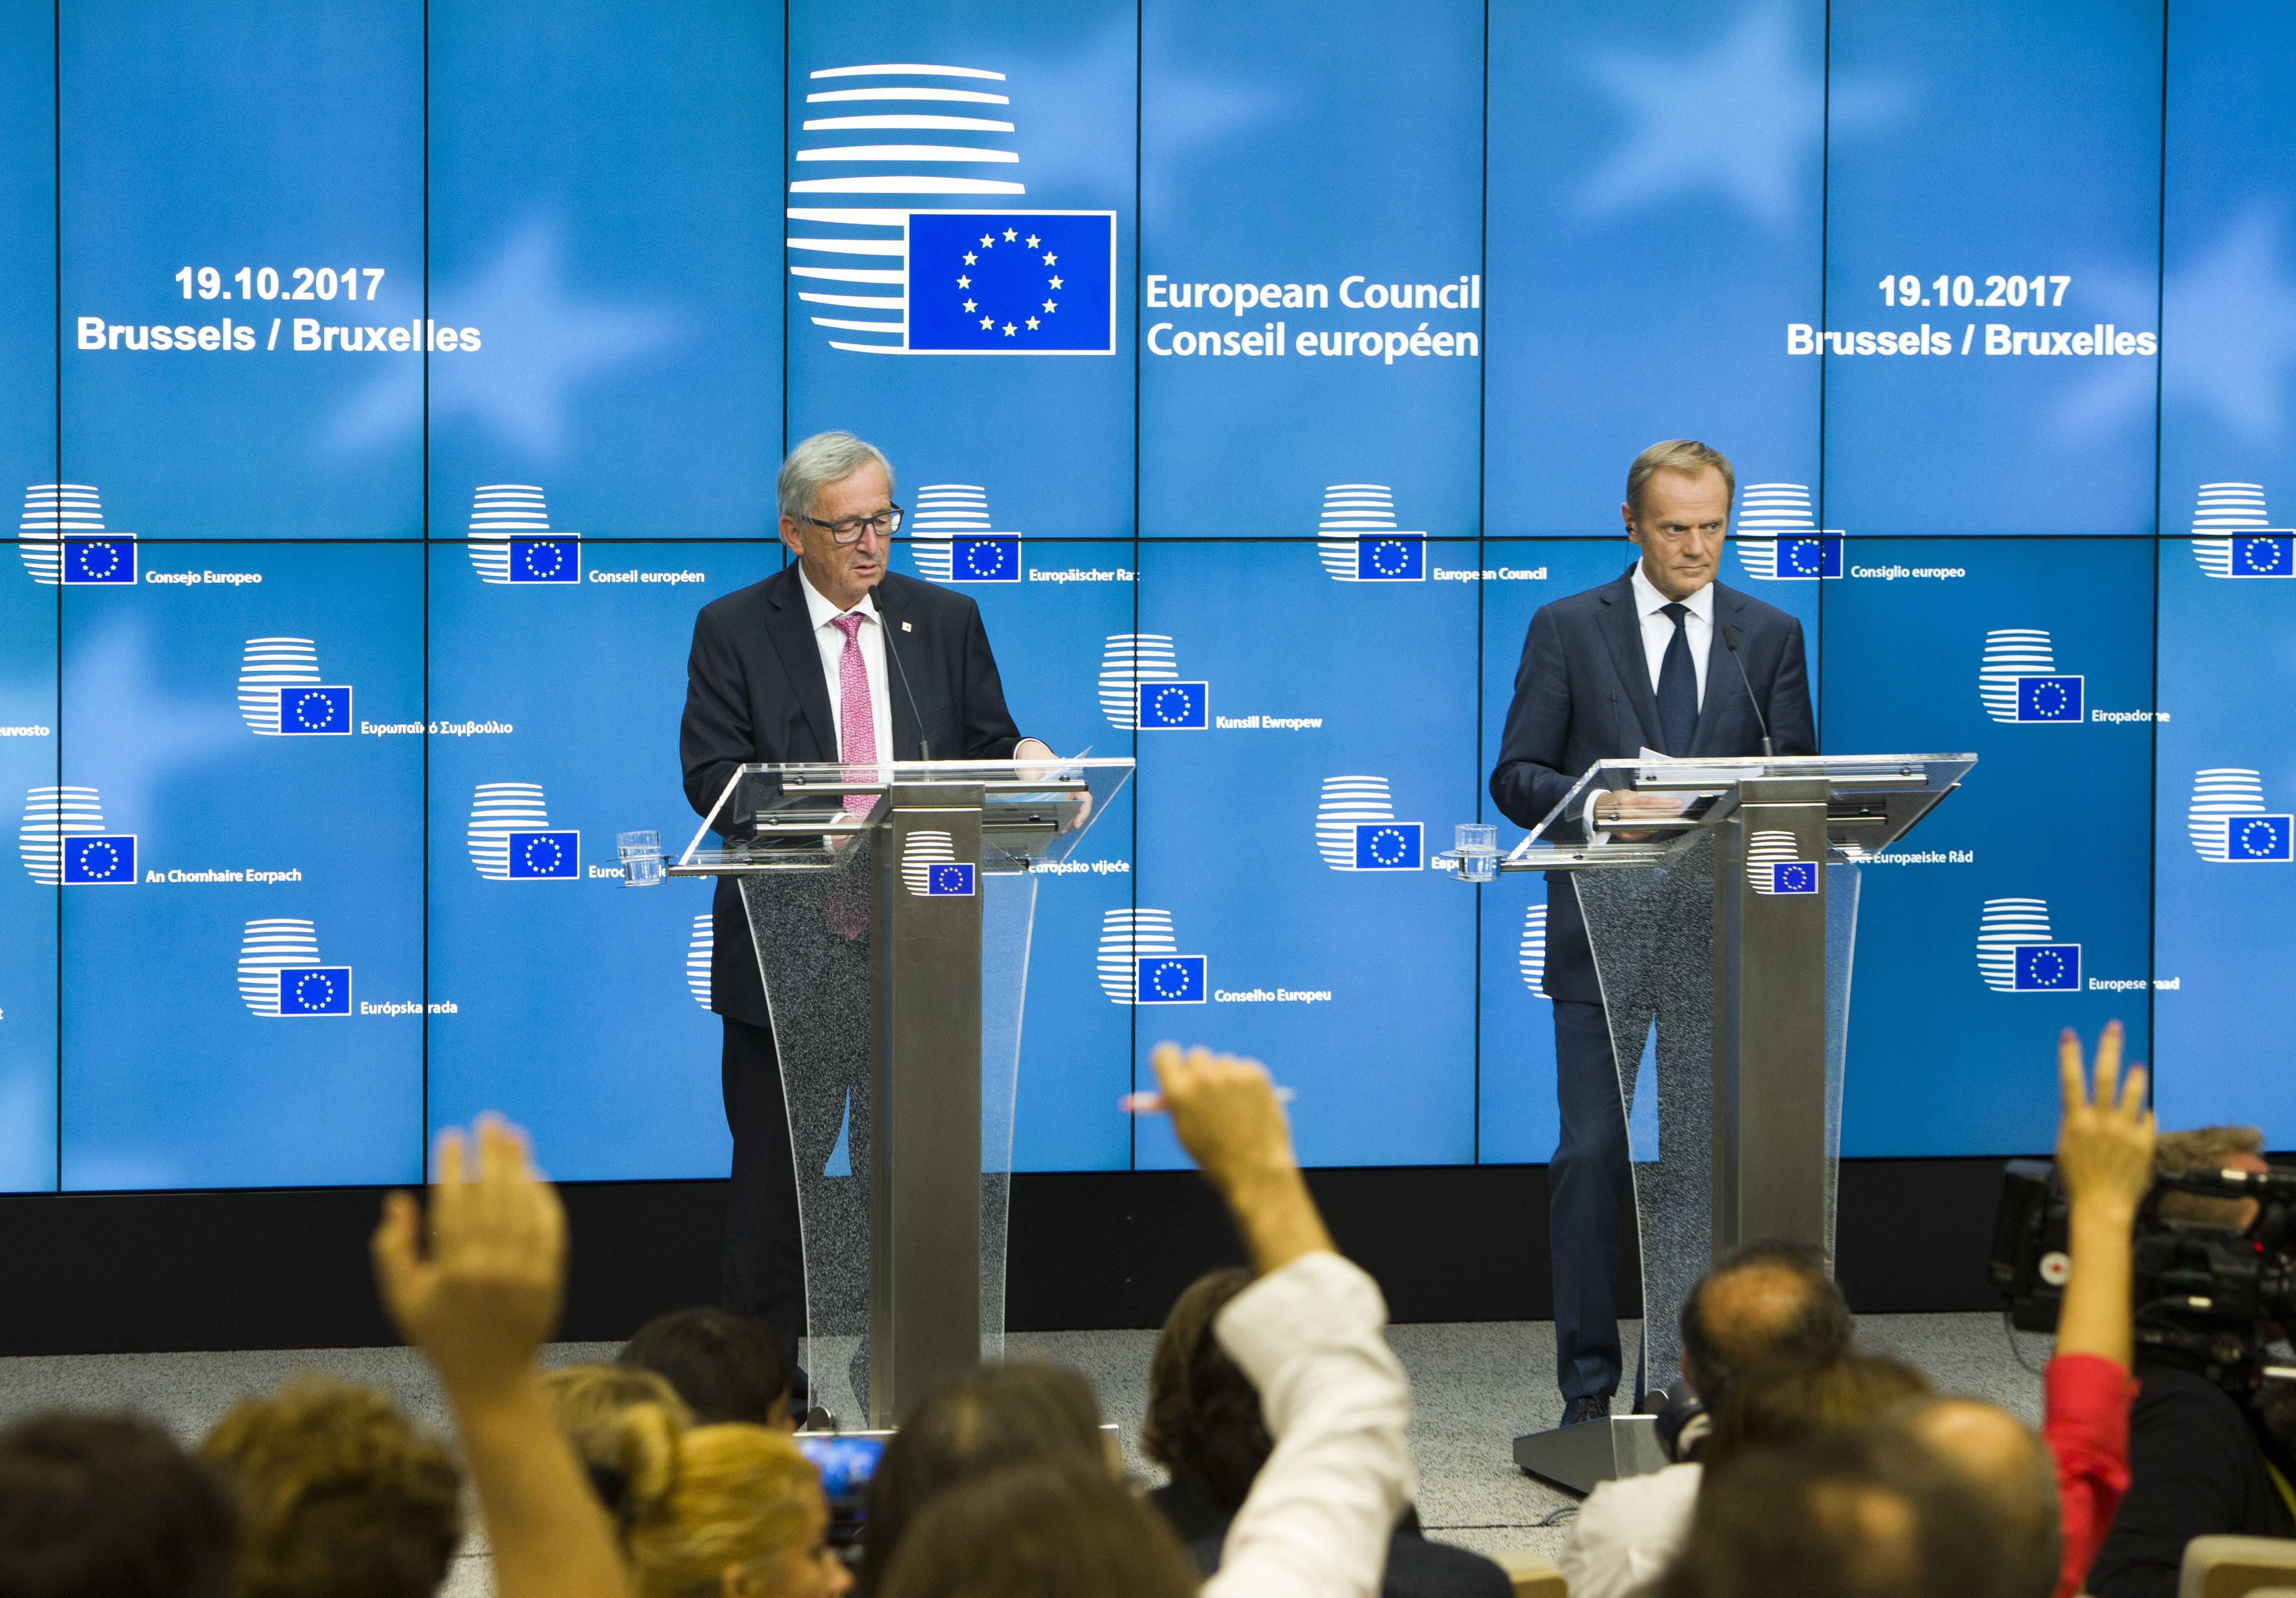 No role for European Union  mediation in Catalonia crisis - Tusk